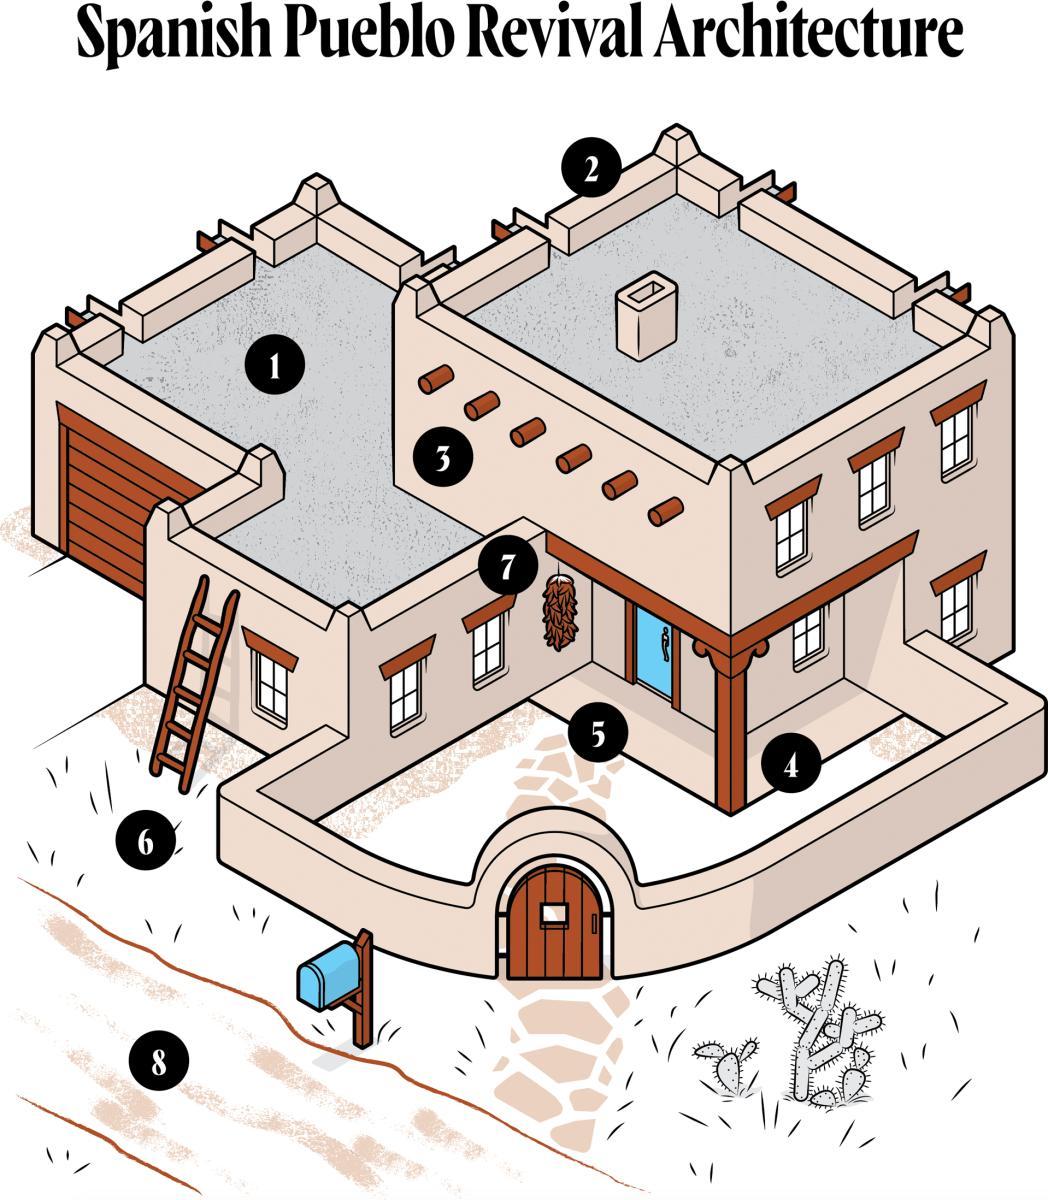 Spanish Pueblo Revival Architecture, New Mexico Magazine